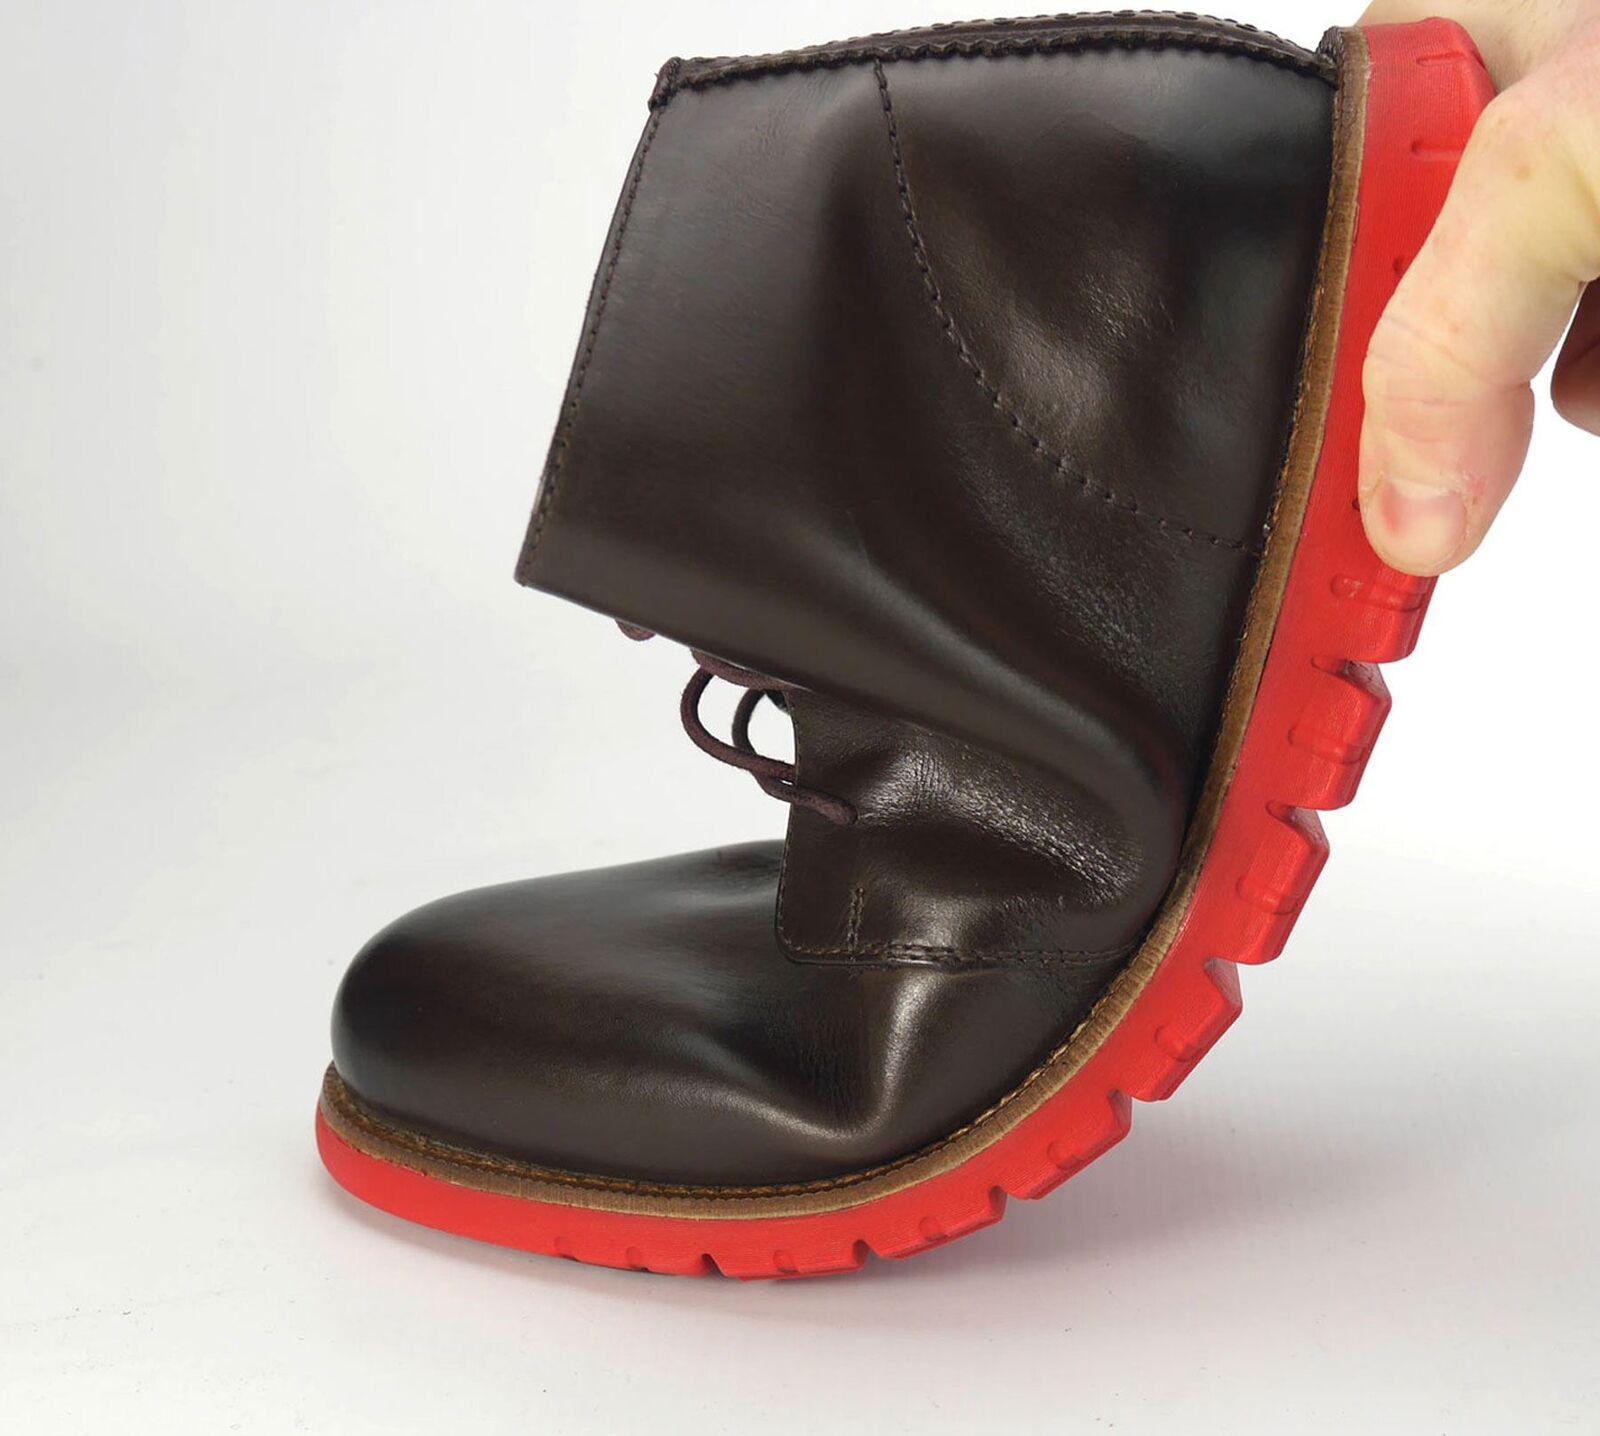 London Brogues Gatz Herren Freizeit Schuhe Chukka ultraleicht Stiefel braun Schuhe Freizeit 8e324d